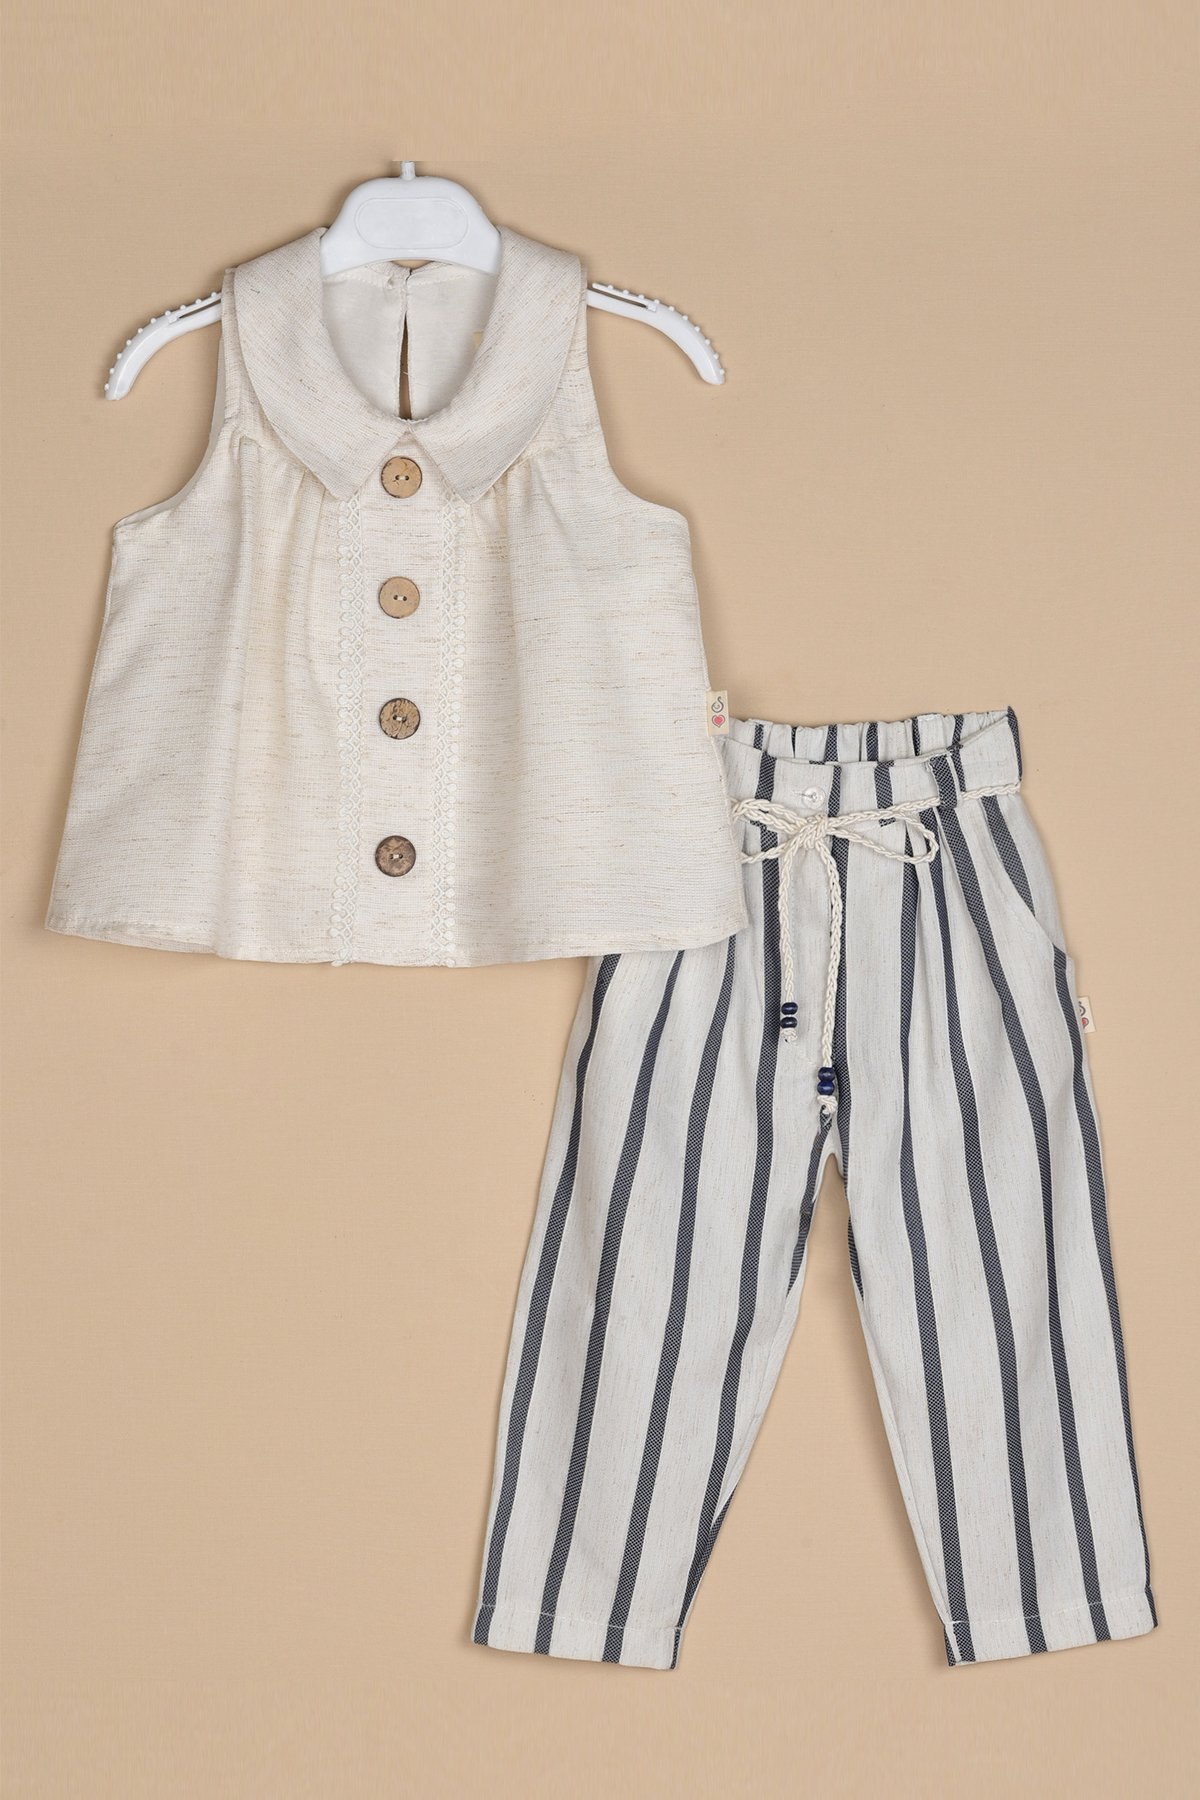 Ahşap Düğmeli Keten Bluz Çizgili Keten Pantolon Takım